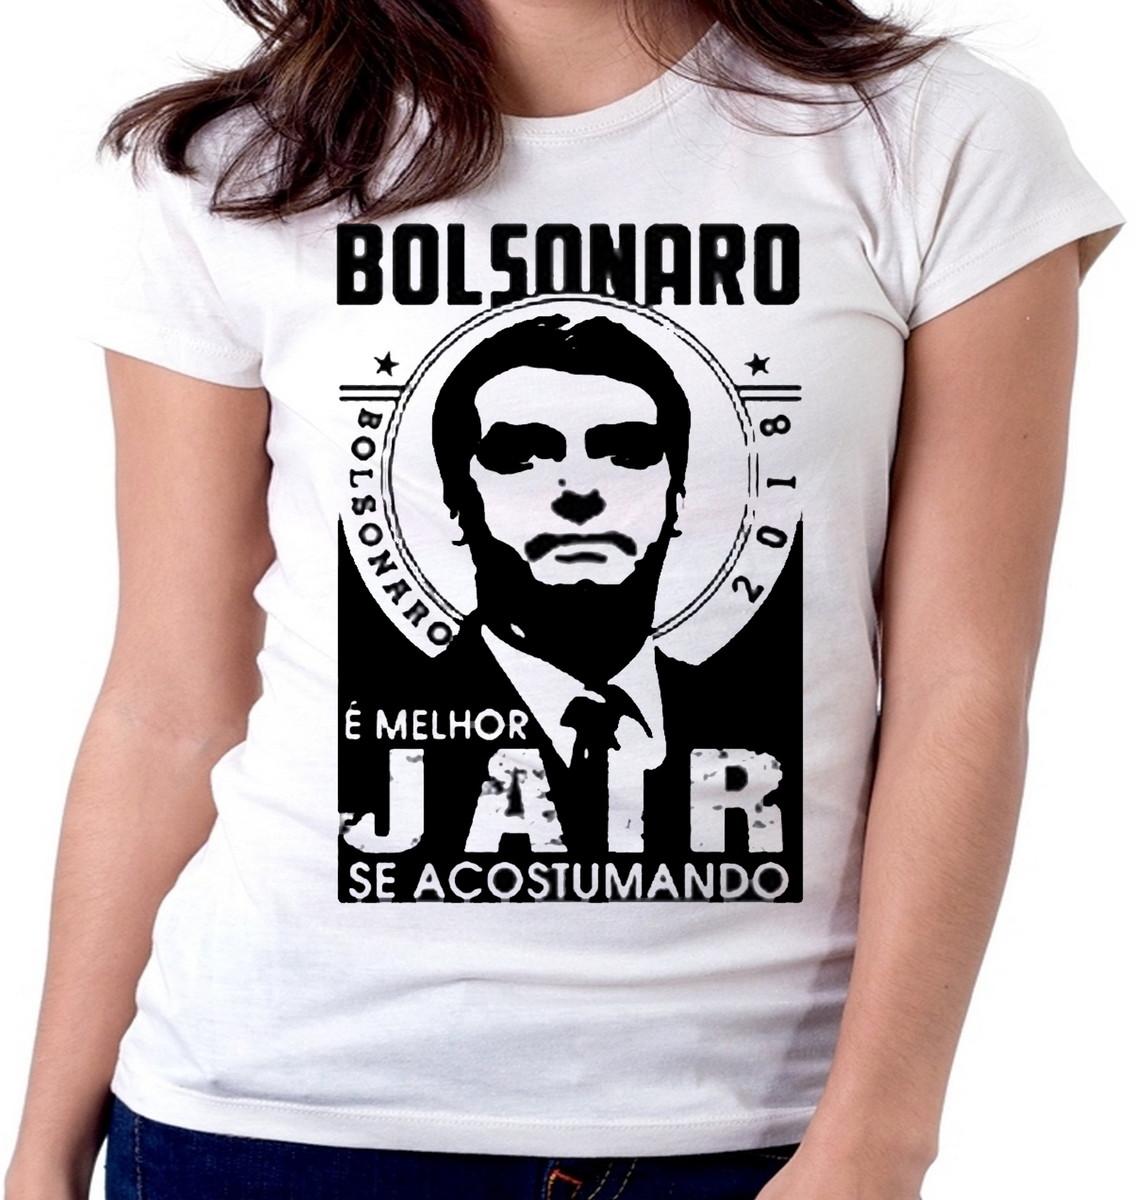 3bf87d5610 Blusa feminina baby look camiseta Bolsonaro melhor Jair se a no Elo7 ...